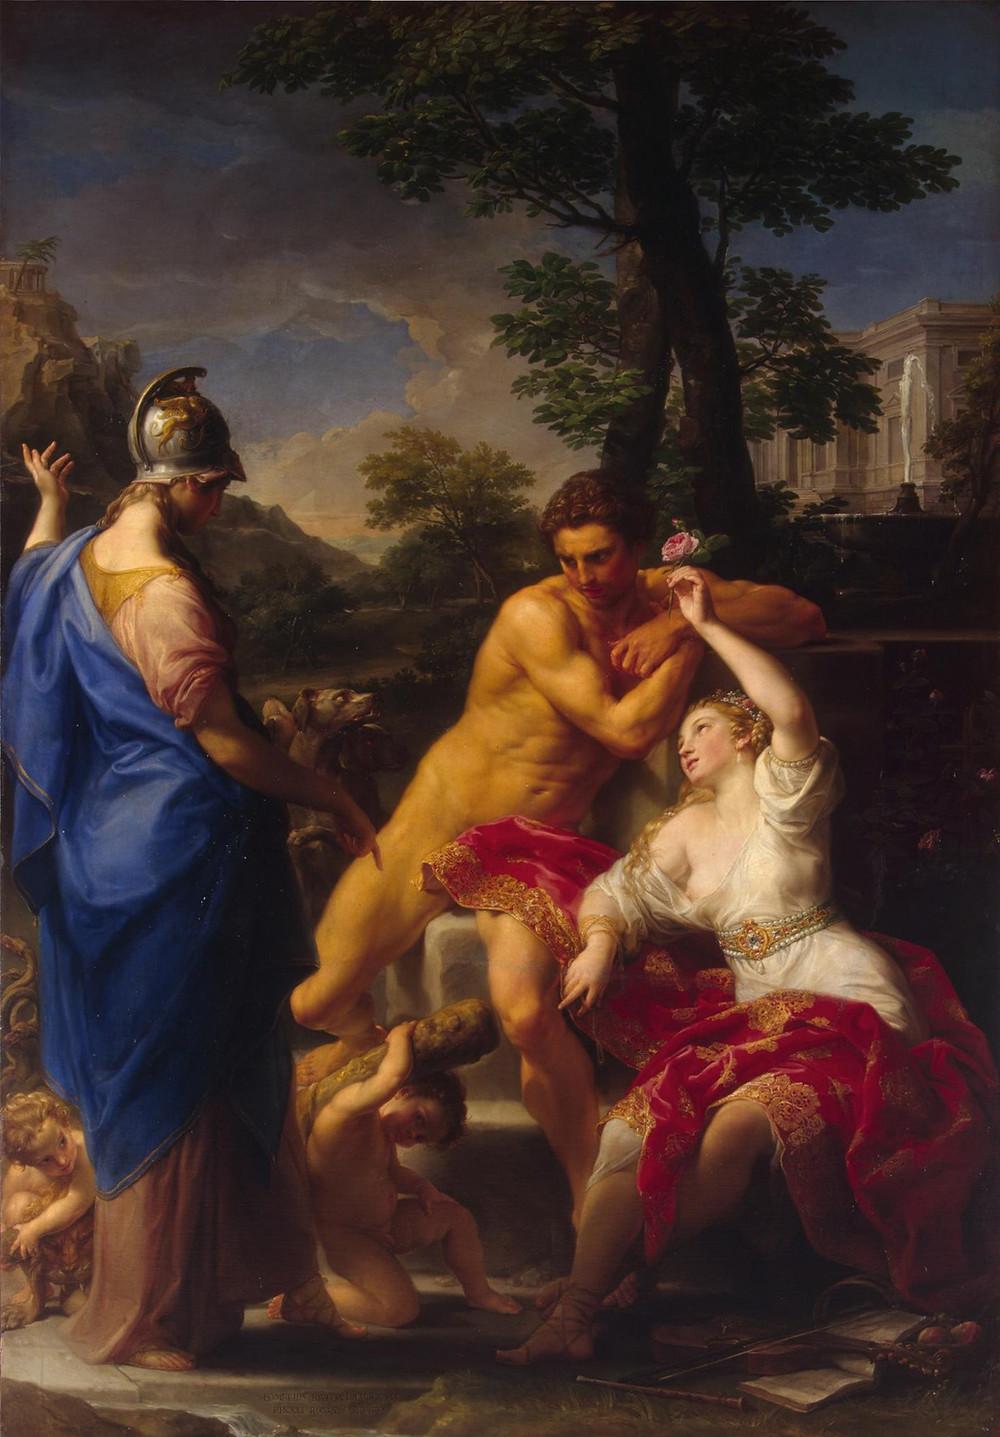 Hercules at the Crossroads - Pompeo Batoni